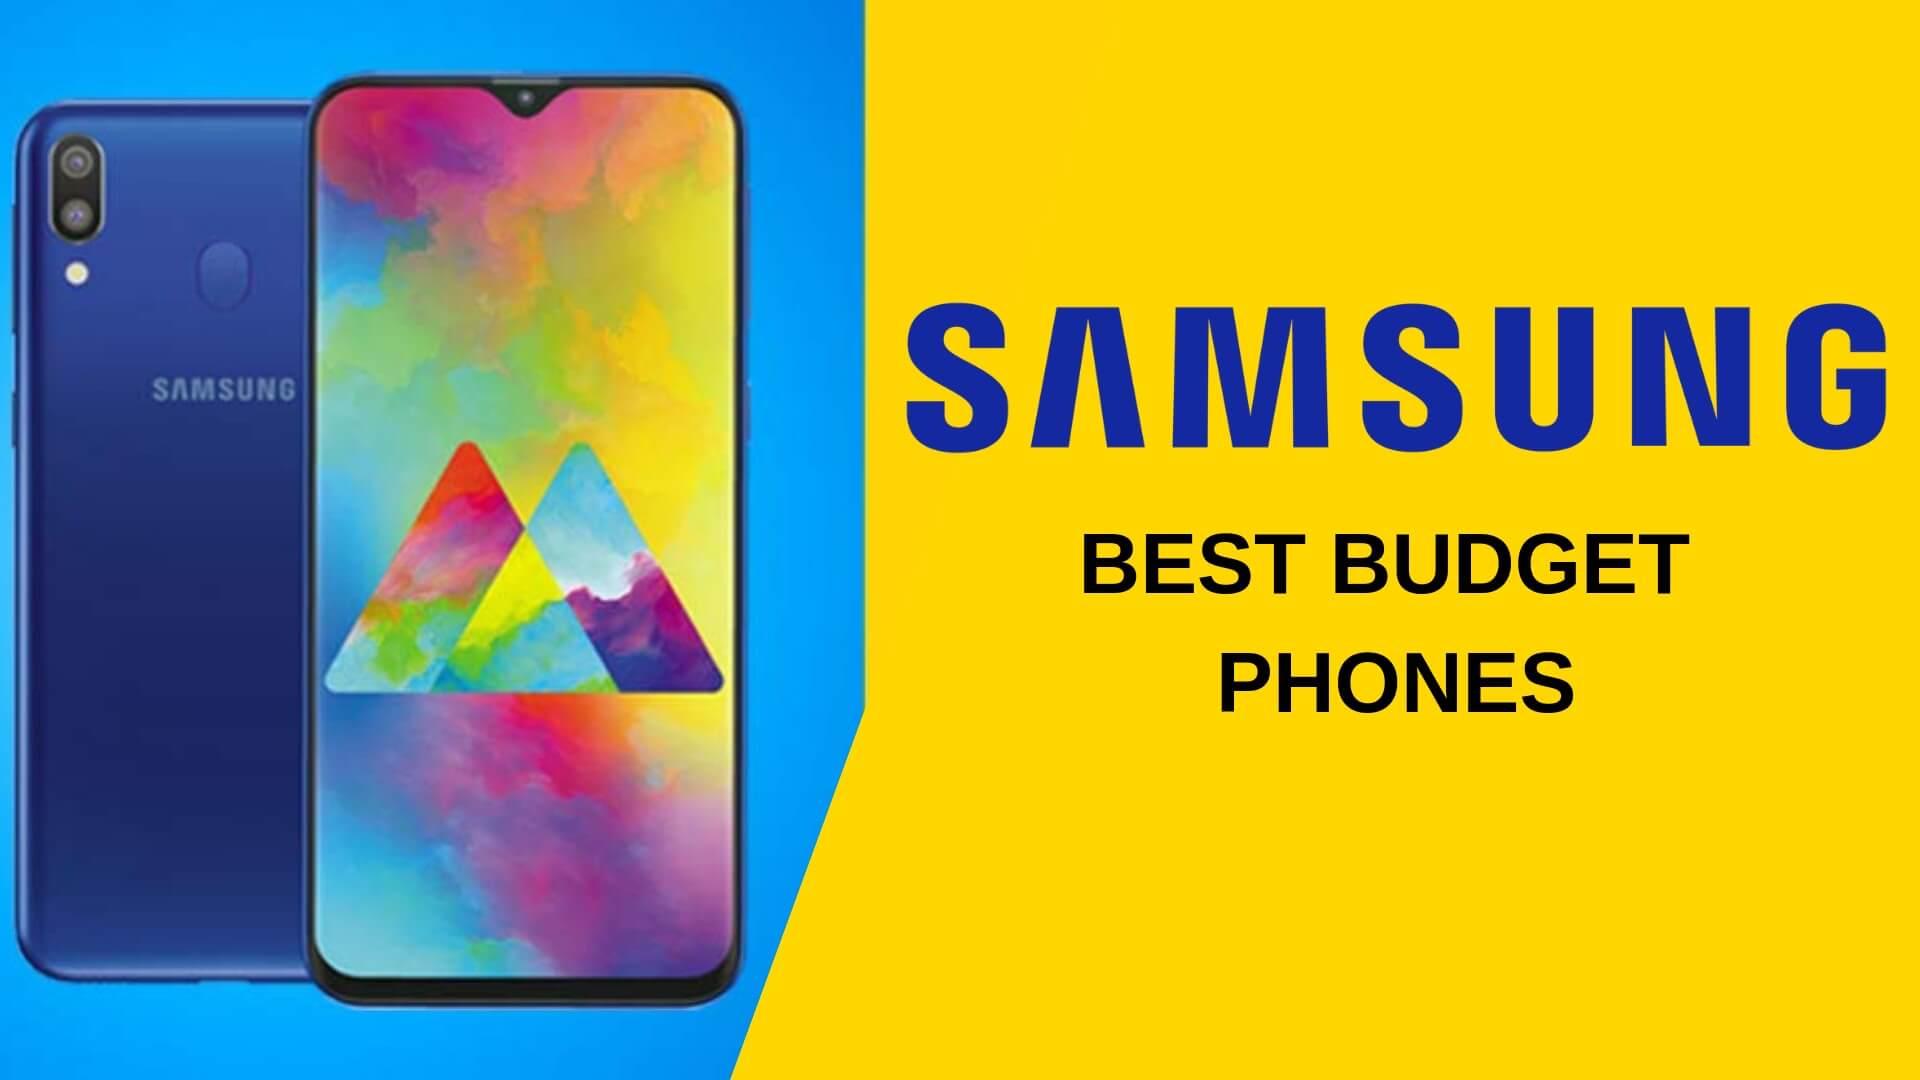 Samsung M10 & Samsung M20 Honest Review in Hindi | Samsung Budget Smartphones